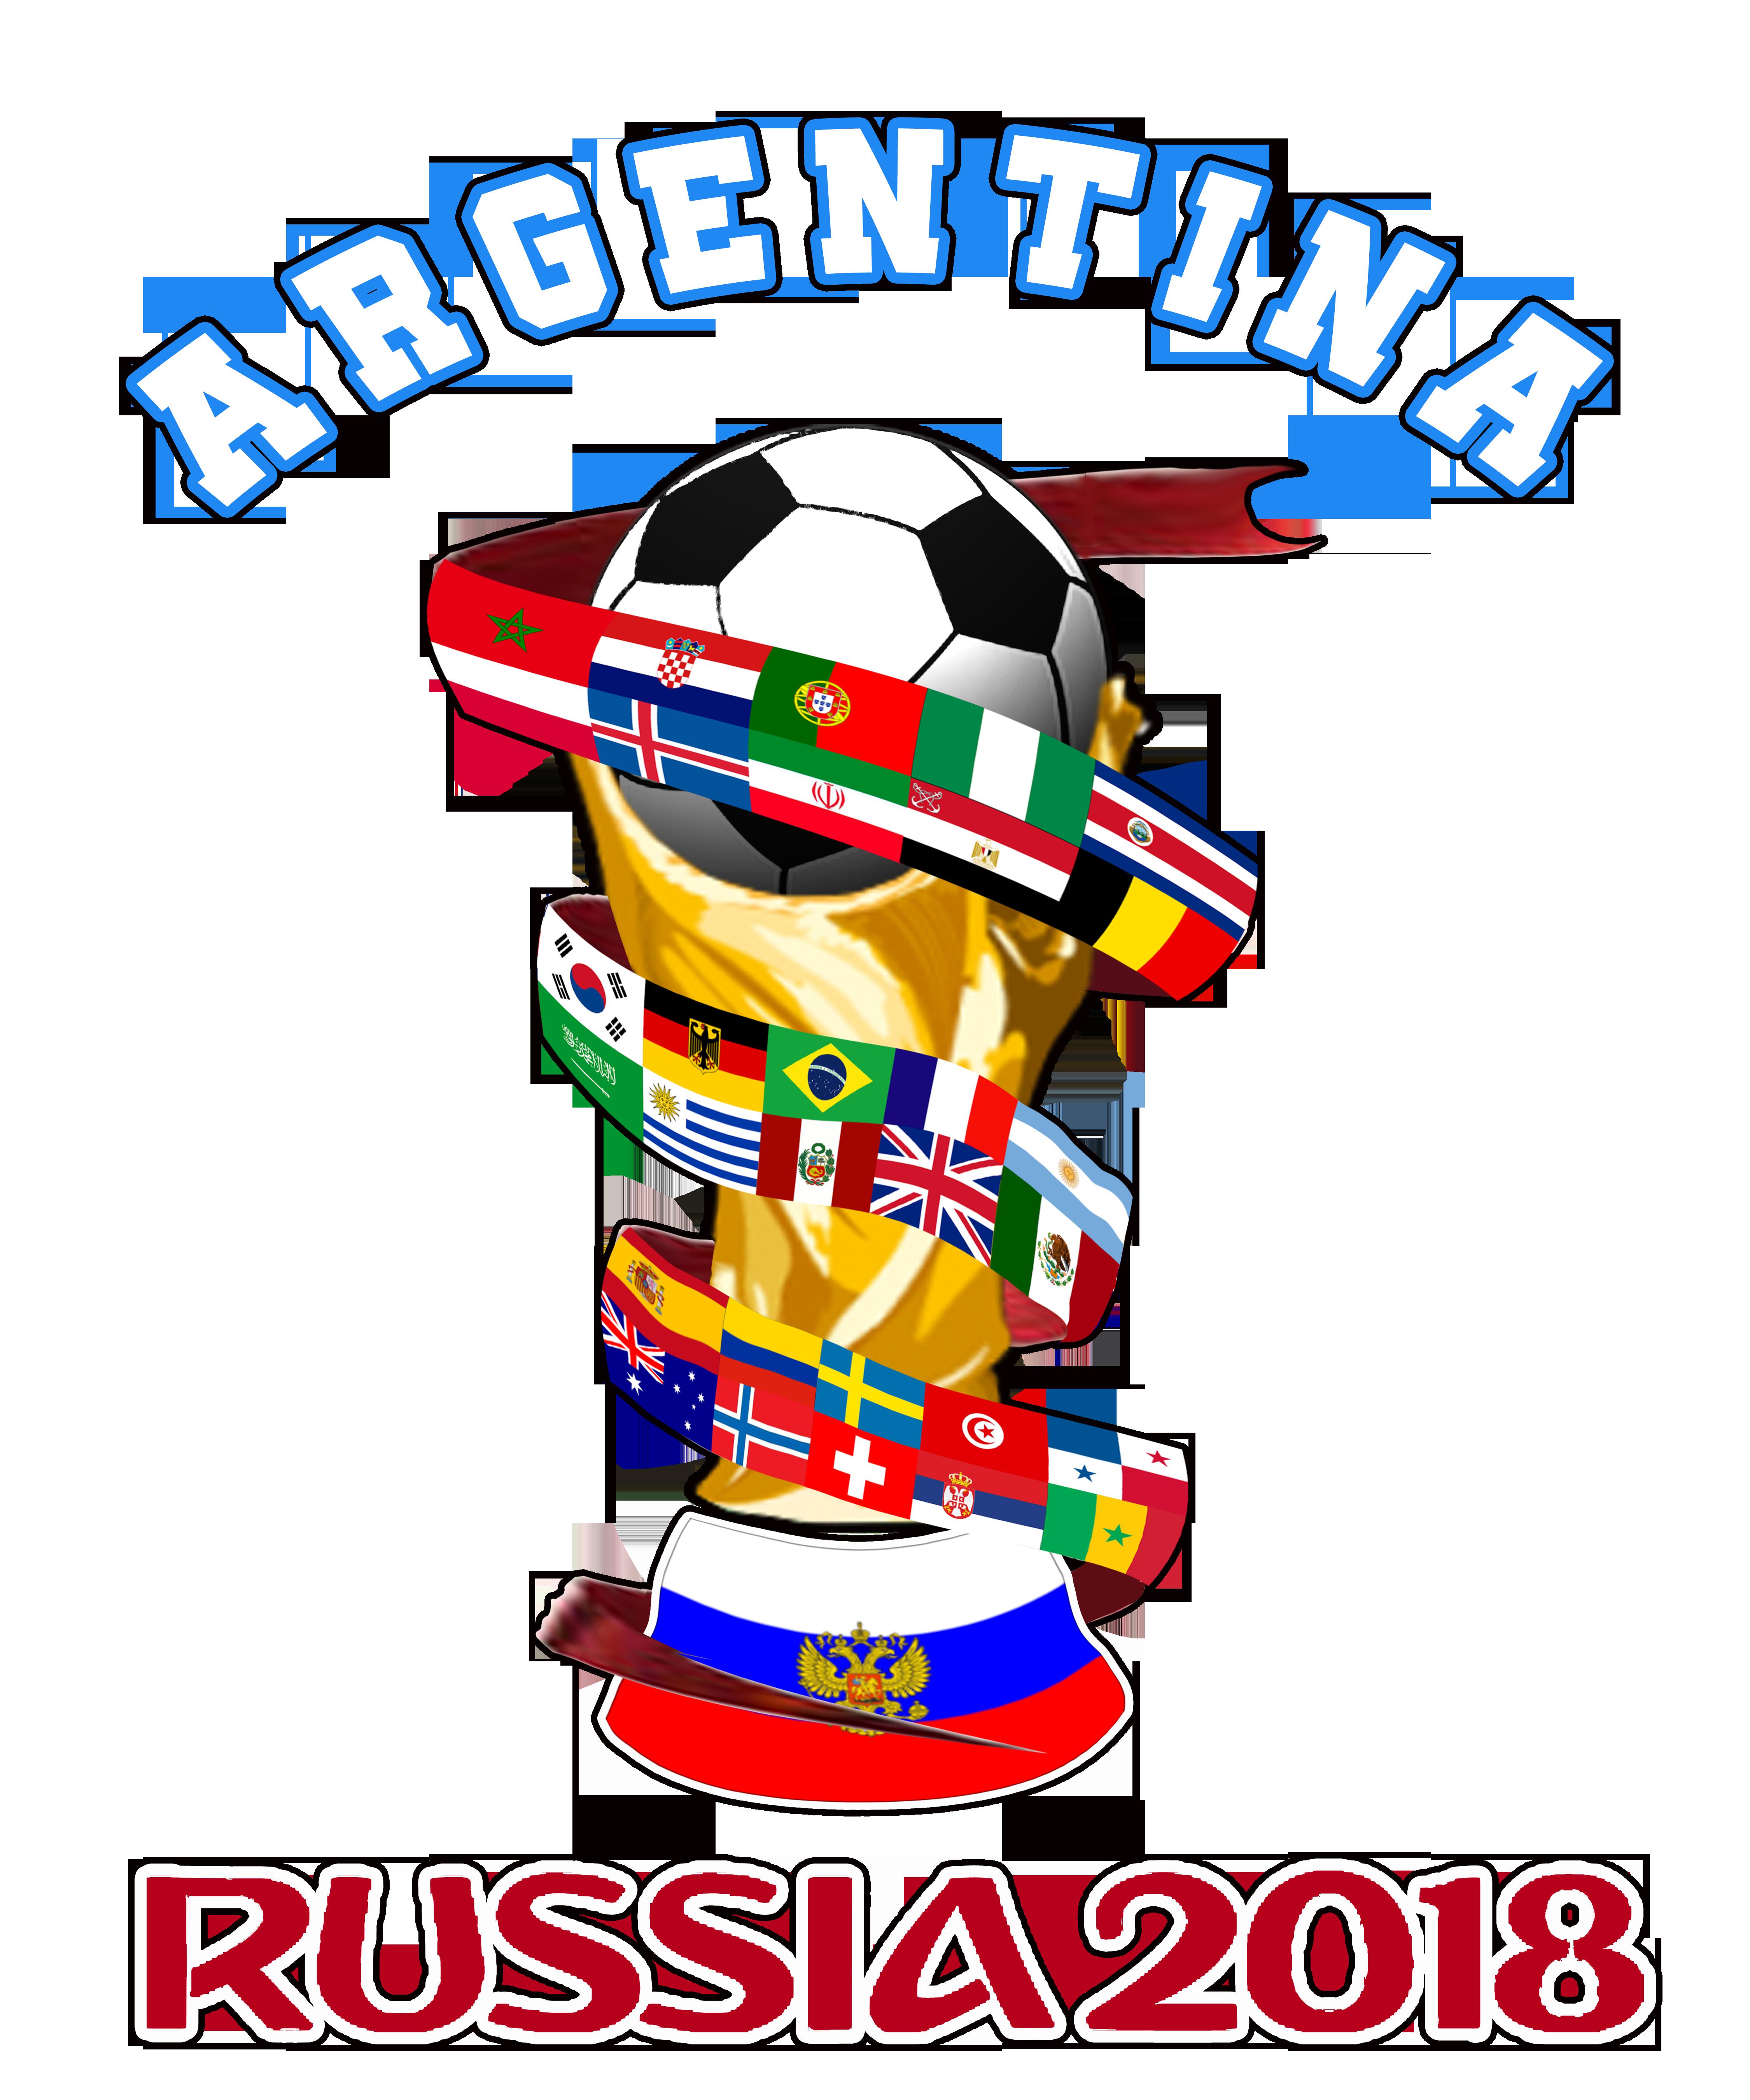 Side view of football cleat clipart vector free ARGENTINA WORLD CUP RUSSIA 2018 | Camisetas, el diseño es todo ... vector free